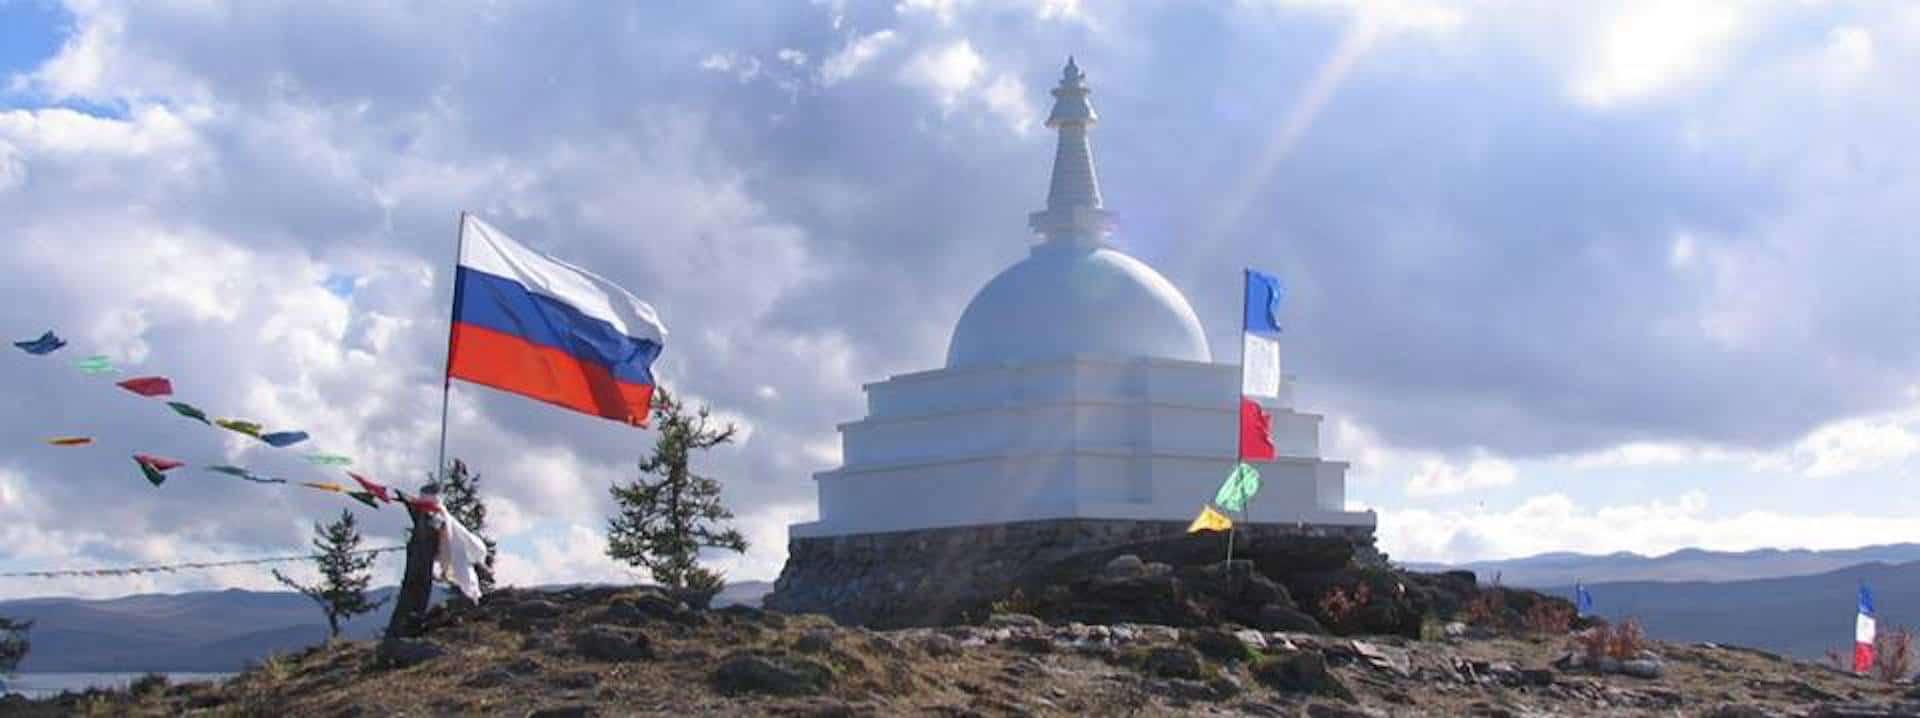 The stupa on the Ogoy island, Lake Baikal, in Siberia. Photo Courtesy: Izabell Blumin.